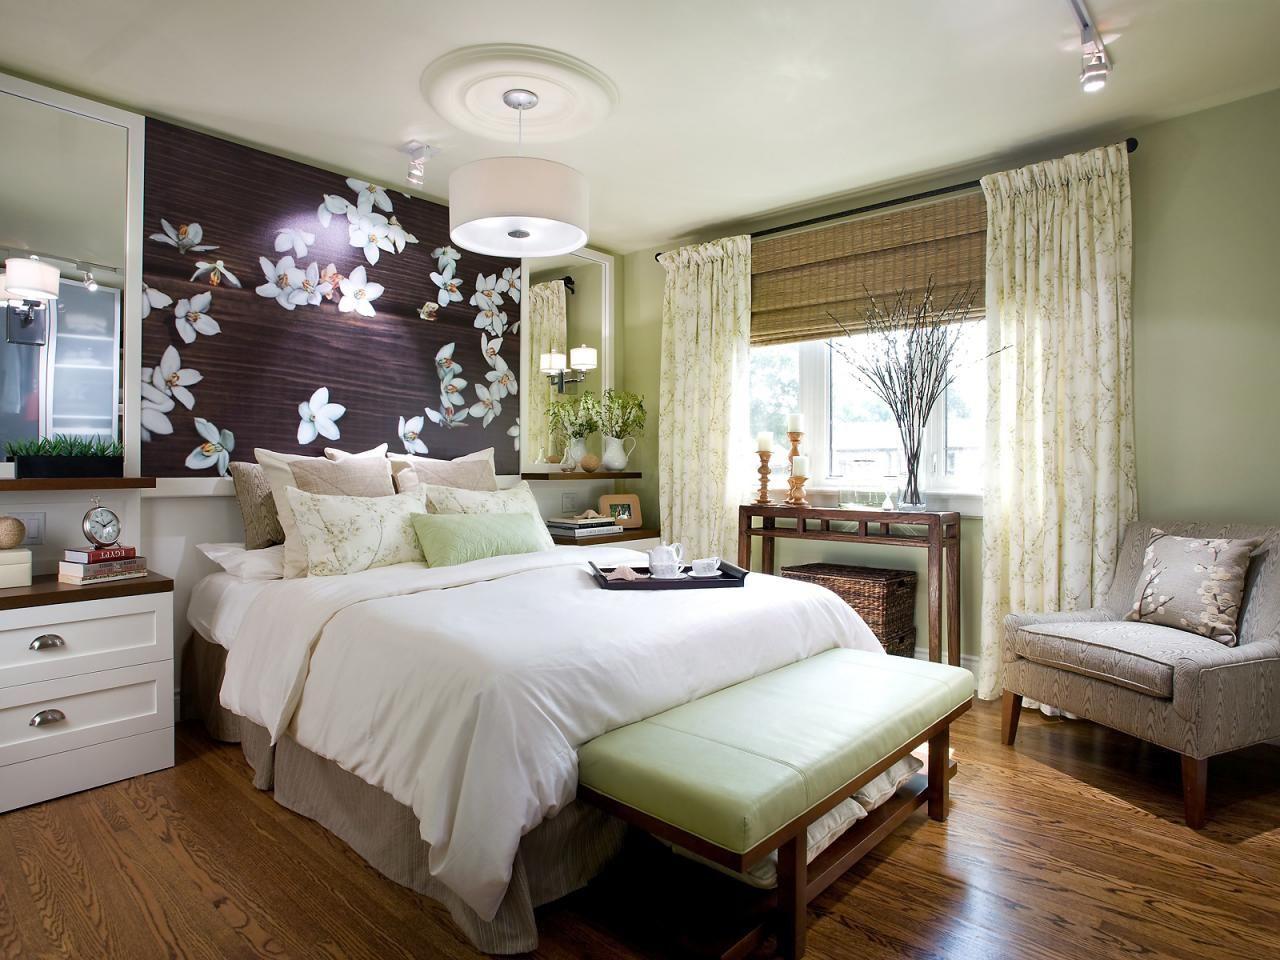 10 Bedroom Retreats From Candice Olson Bedroom Decorating Ideas